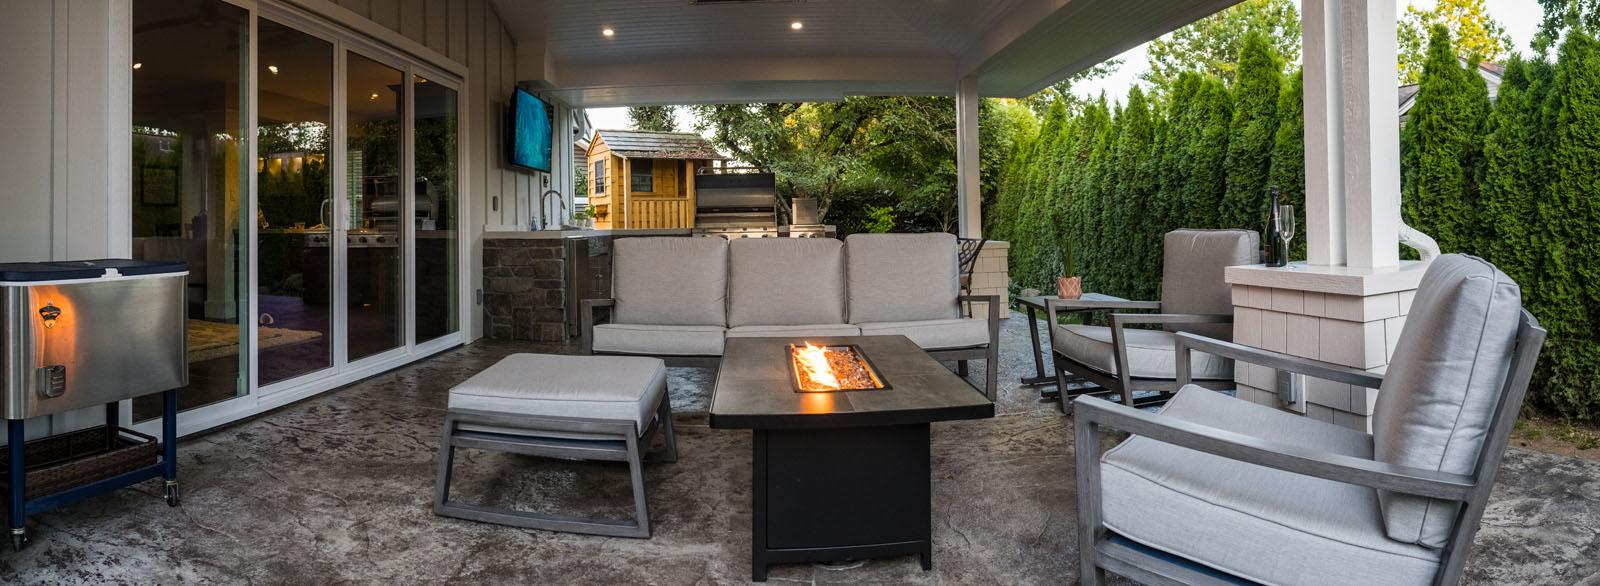 custom-backyard-designs-azuro-TUR064